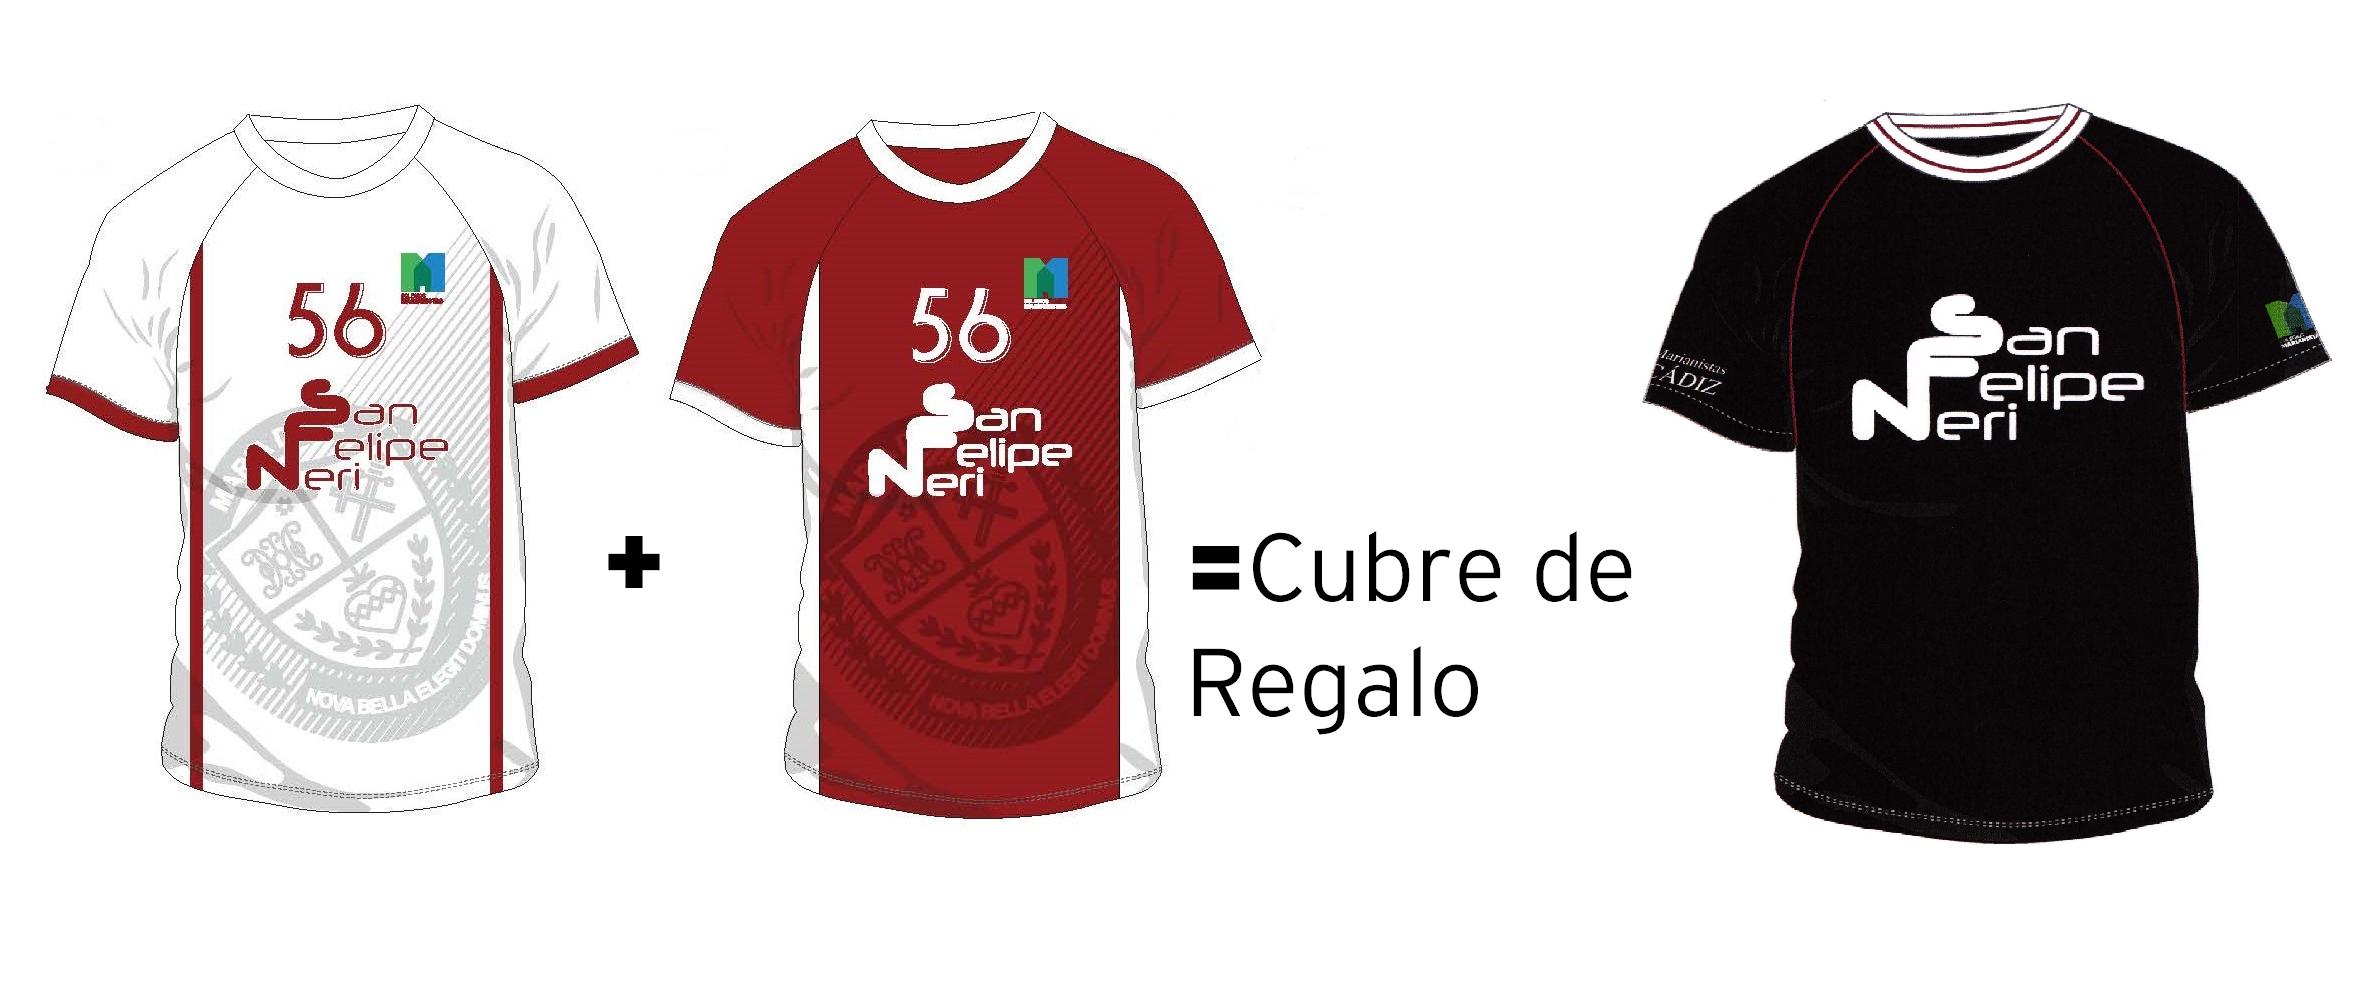 LOTE CAMISETAS MULTIDEPORTE (Fútbol, Voleibol masculino y Balonmano)